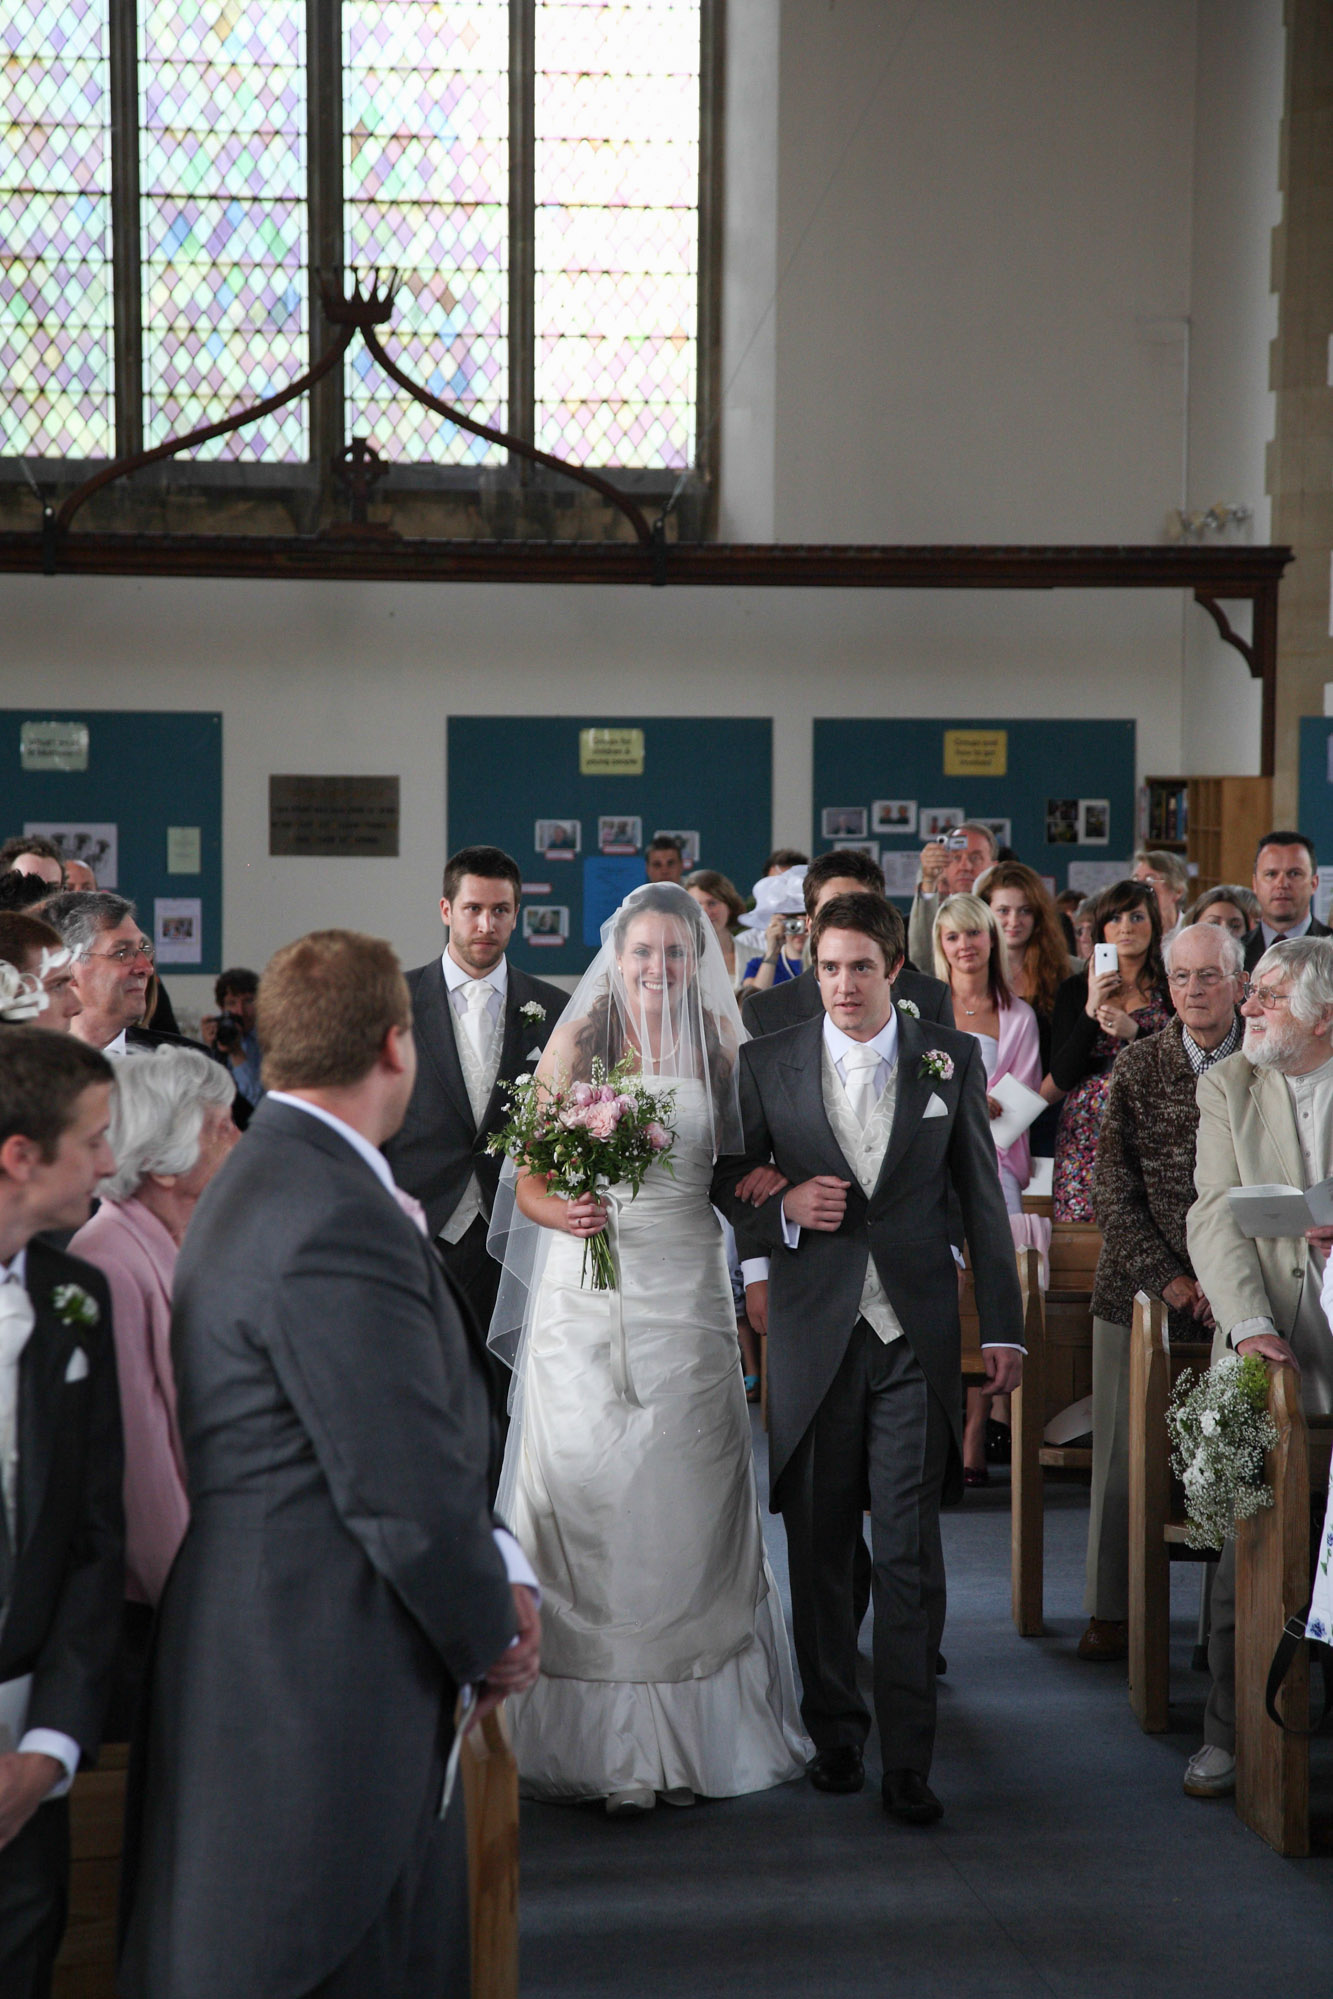 weddings-couples-love-photographer-oxford-london-jonathan-self-photography-25.jpg